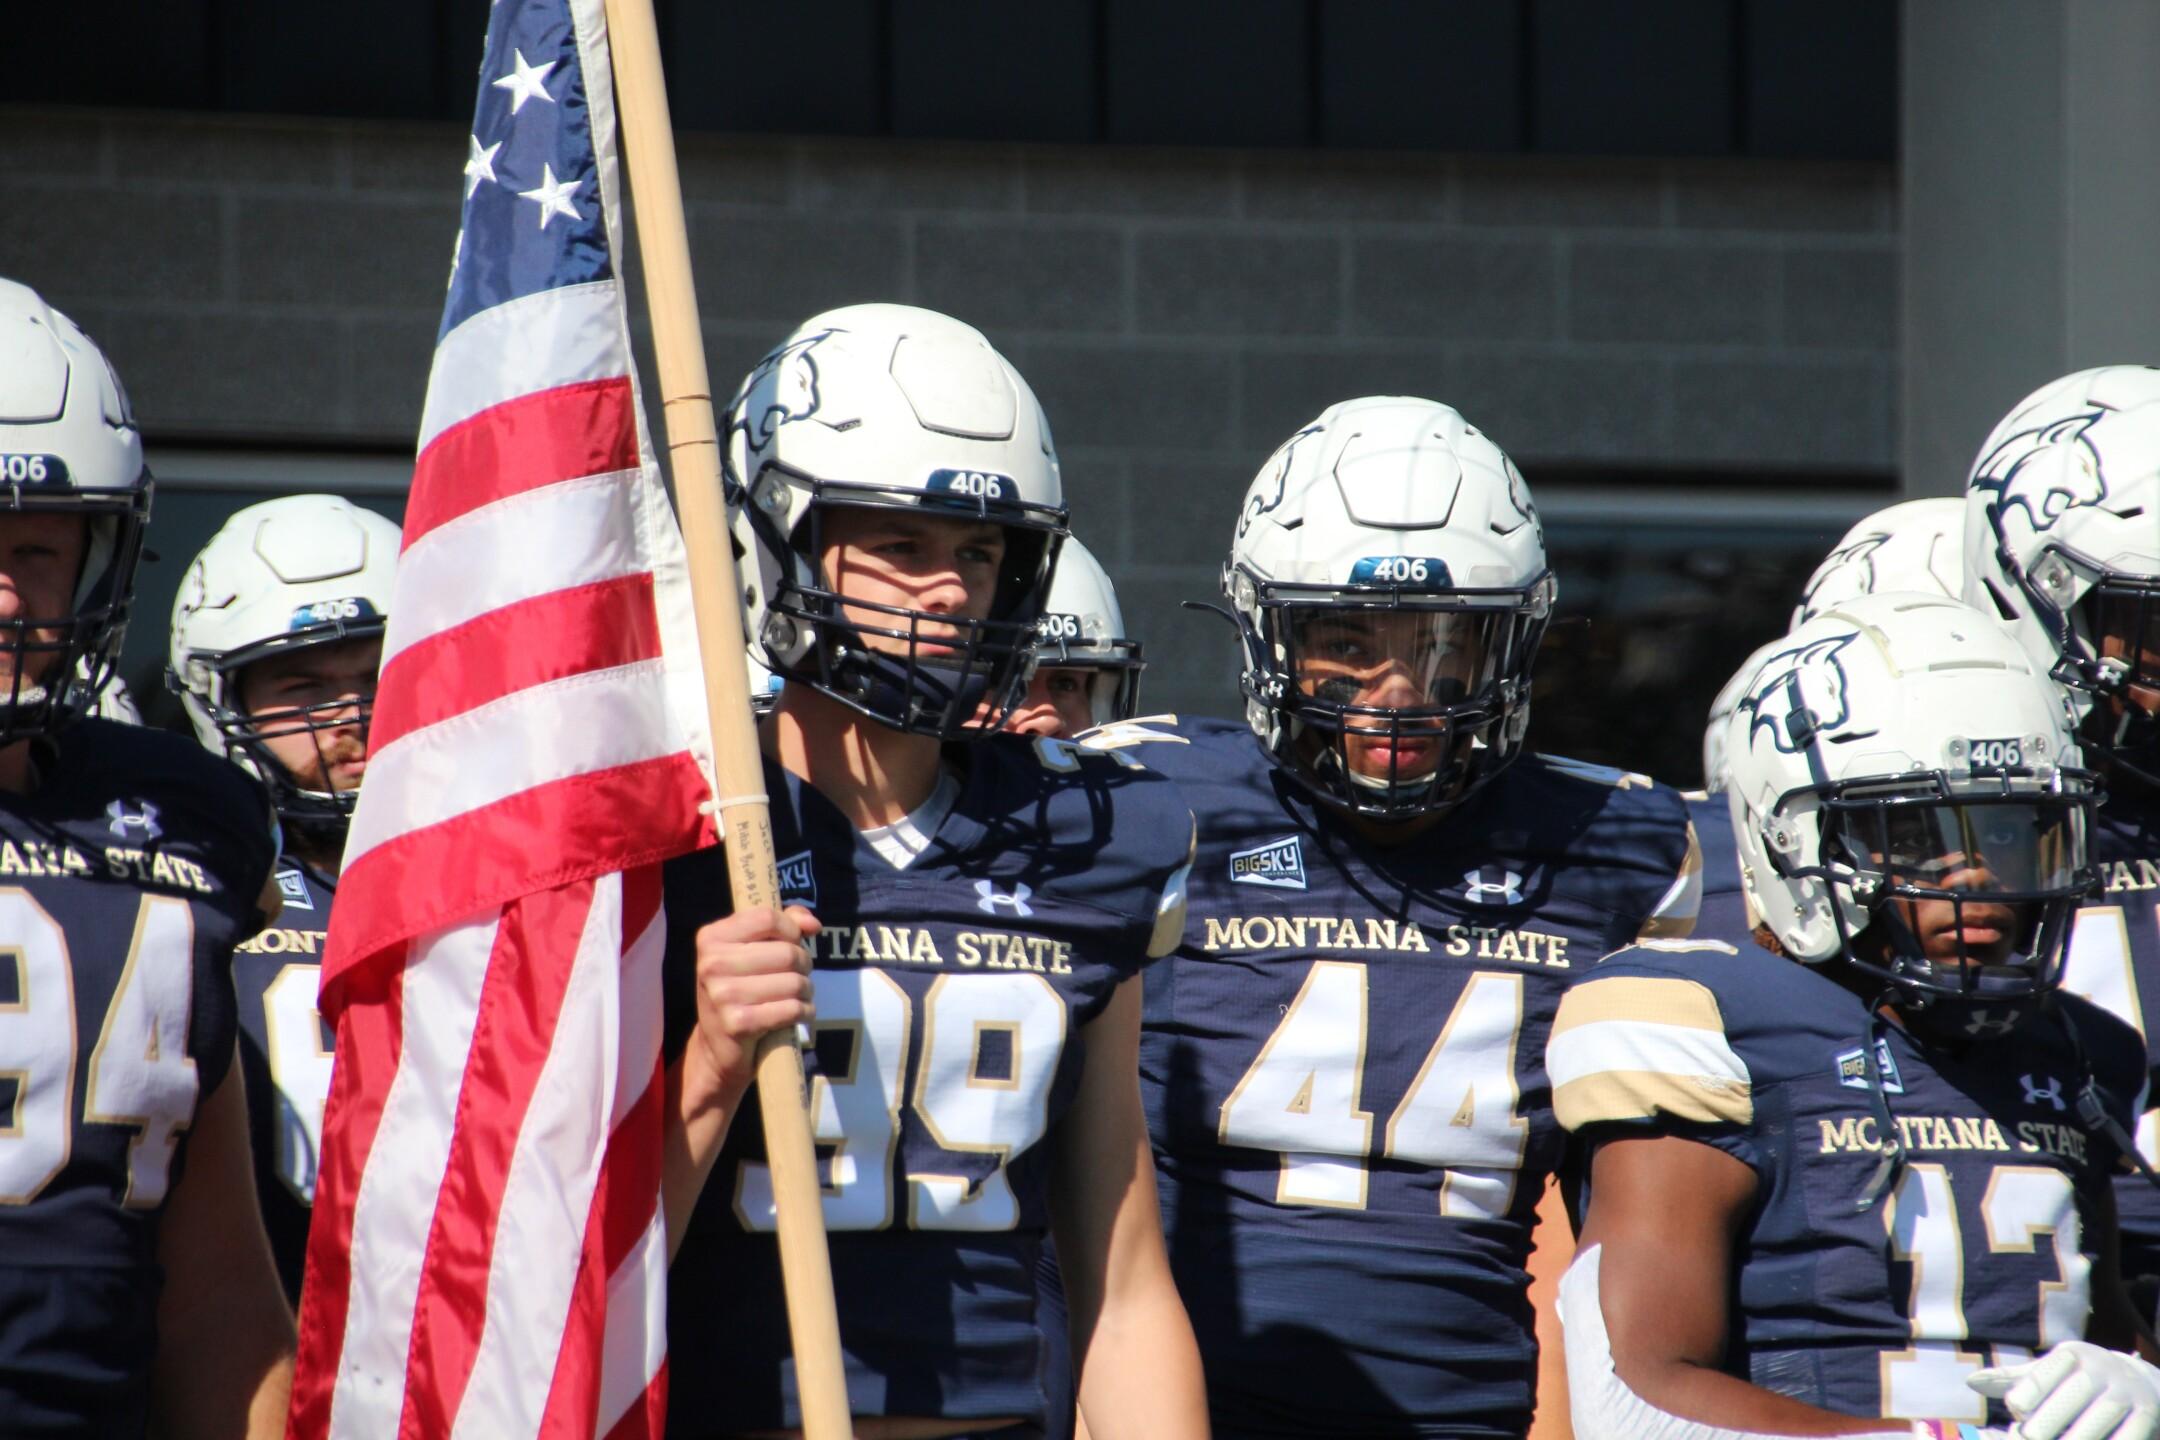 Blake Glessner carries the American Flag